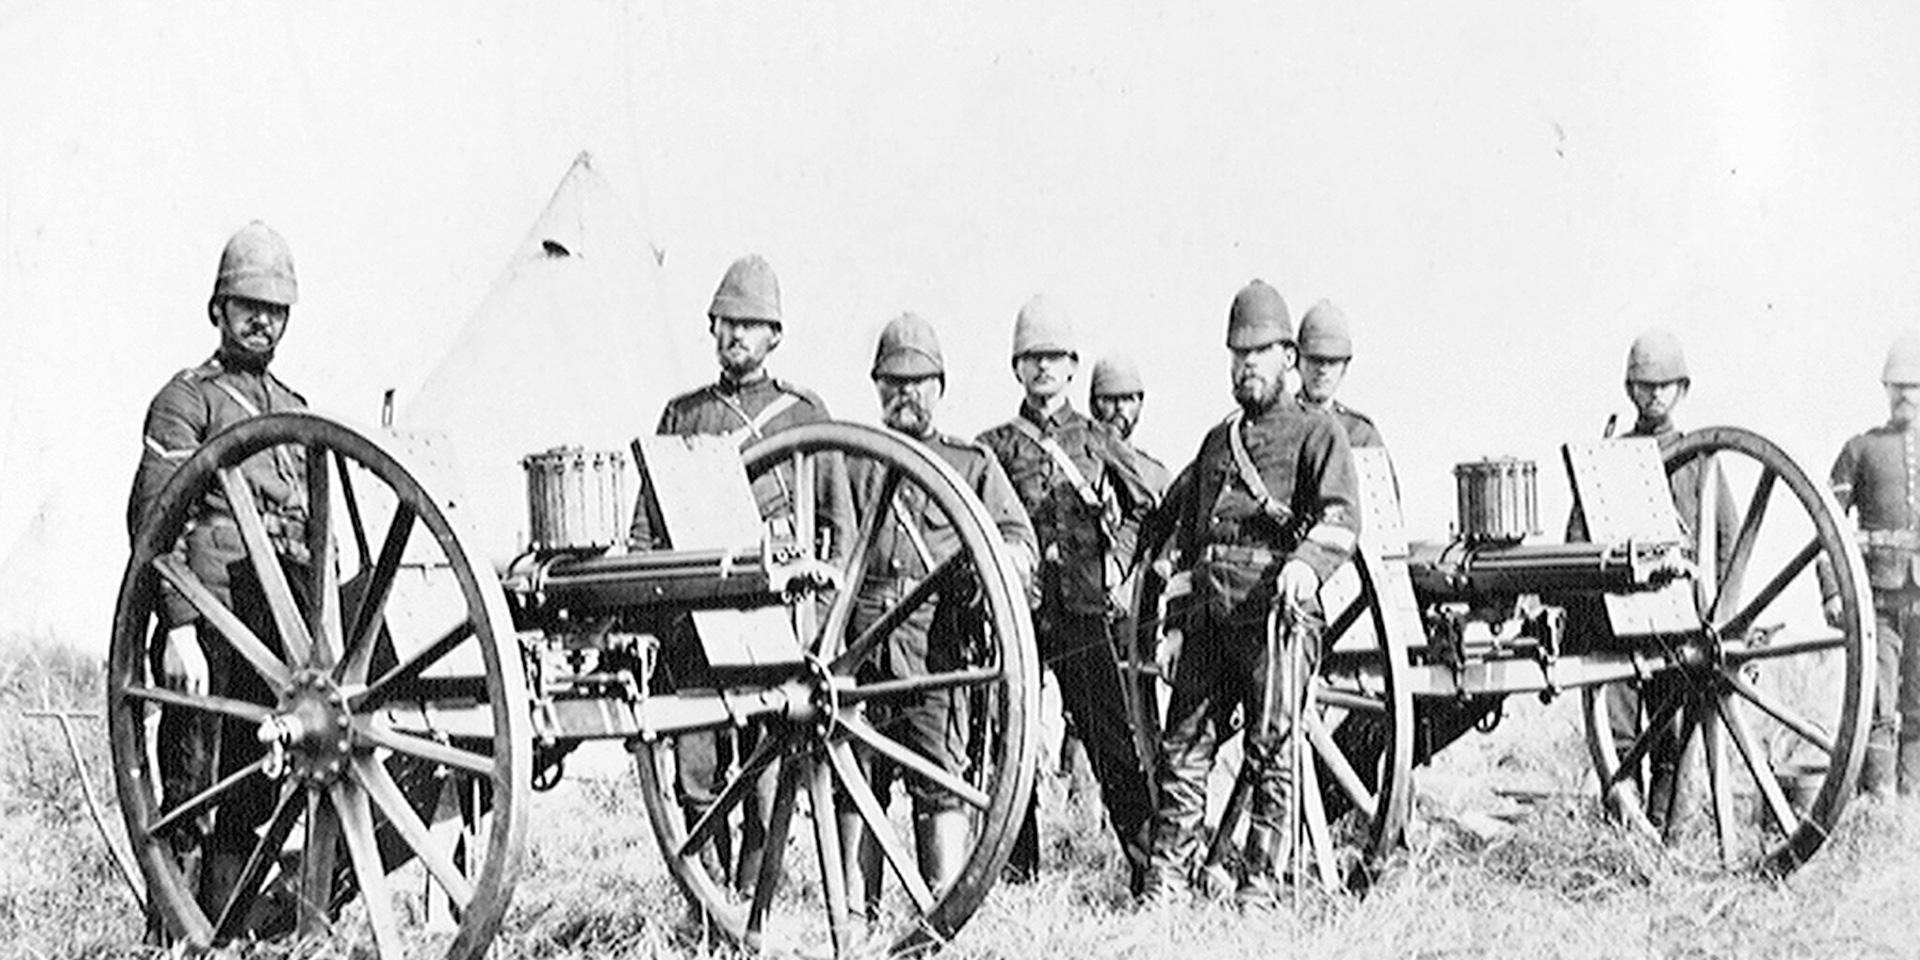 Gatling guns, 1879